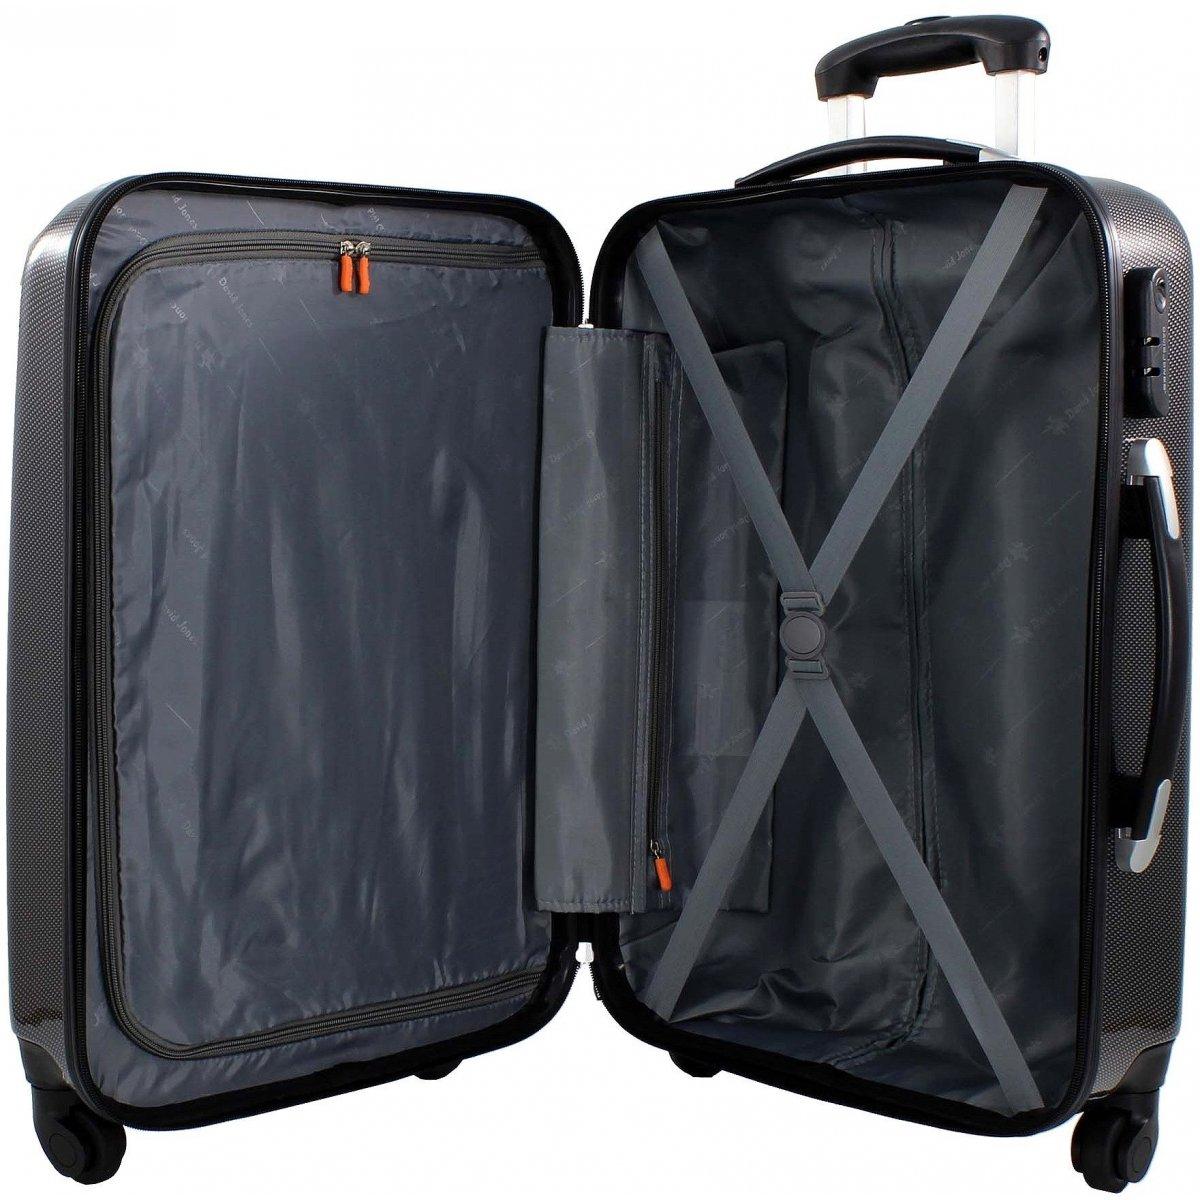 valise rigide david jones taille g 76cm ba20541g couleur principale brooklyn valise pas. Black Bedroom Furniture Sets. Home Design Ideas